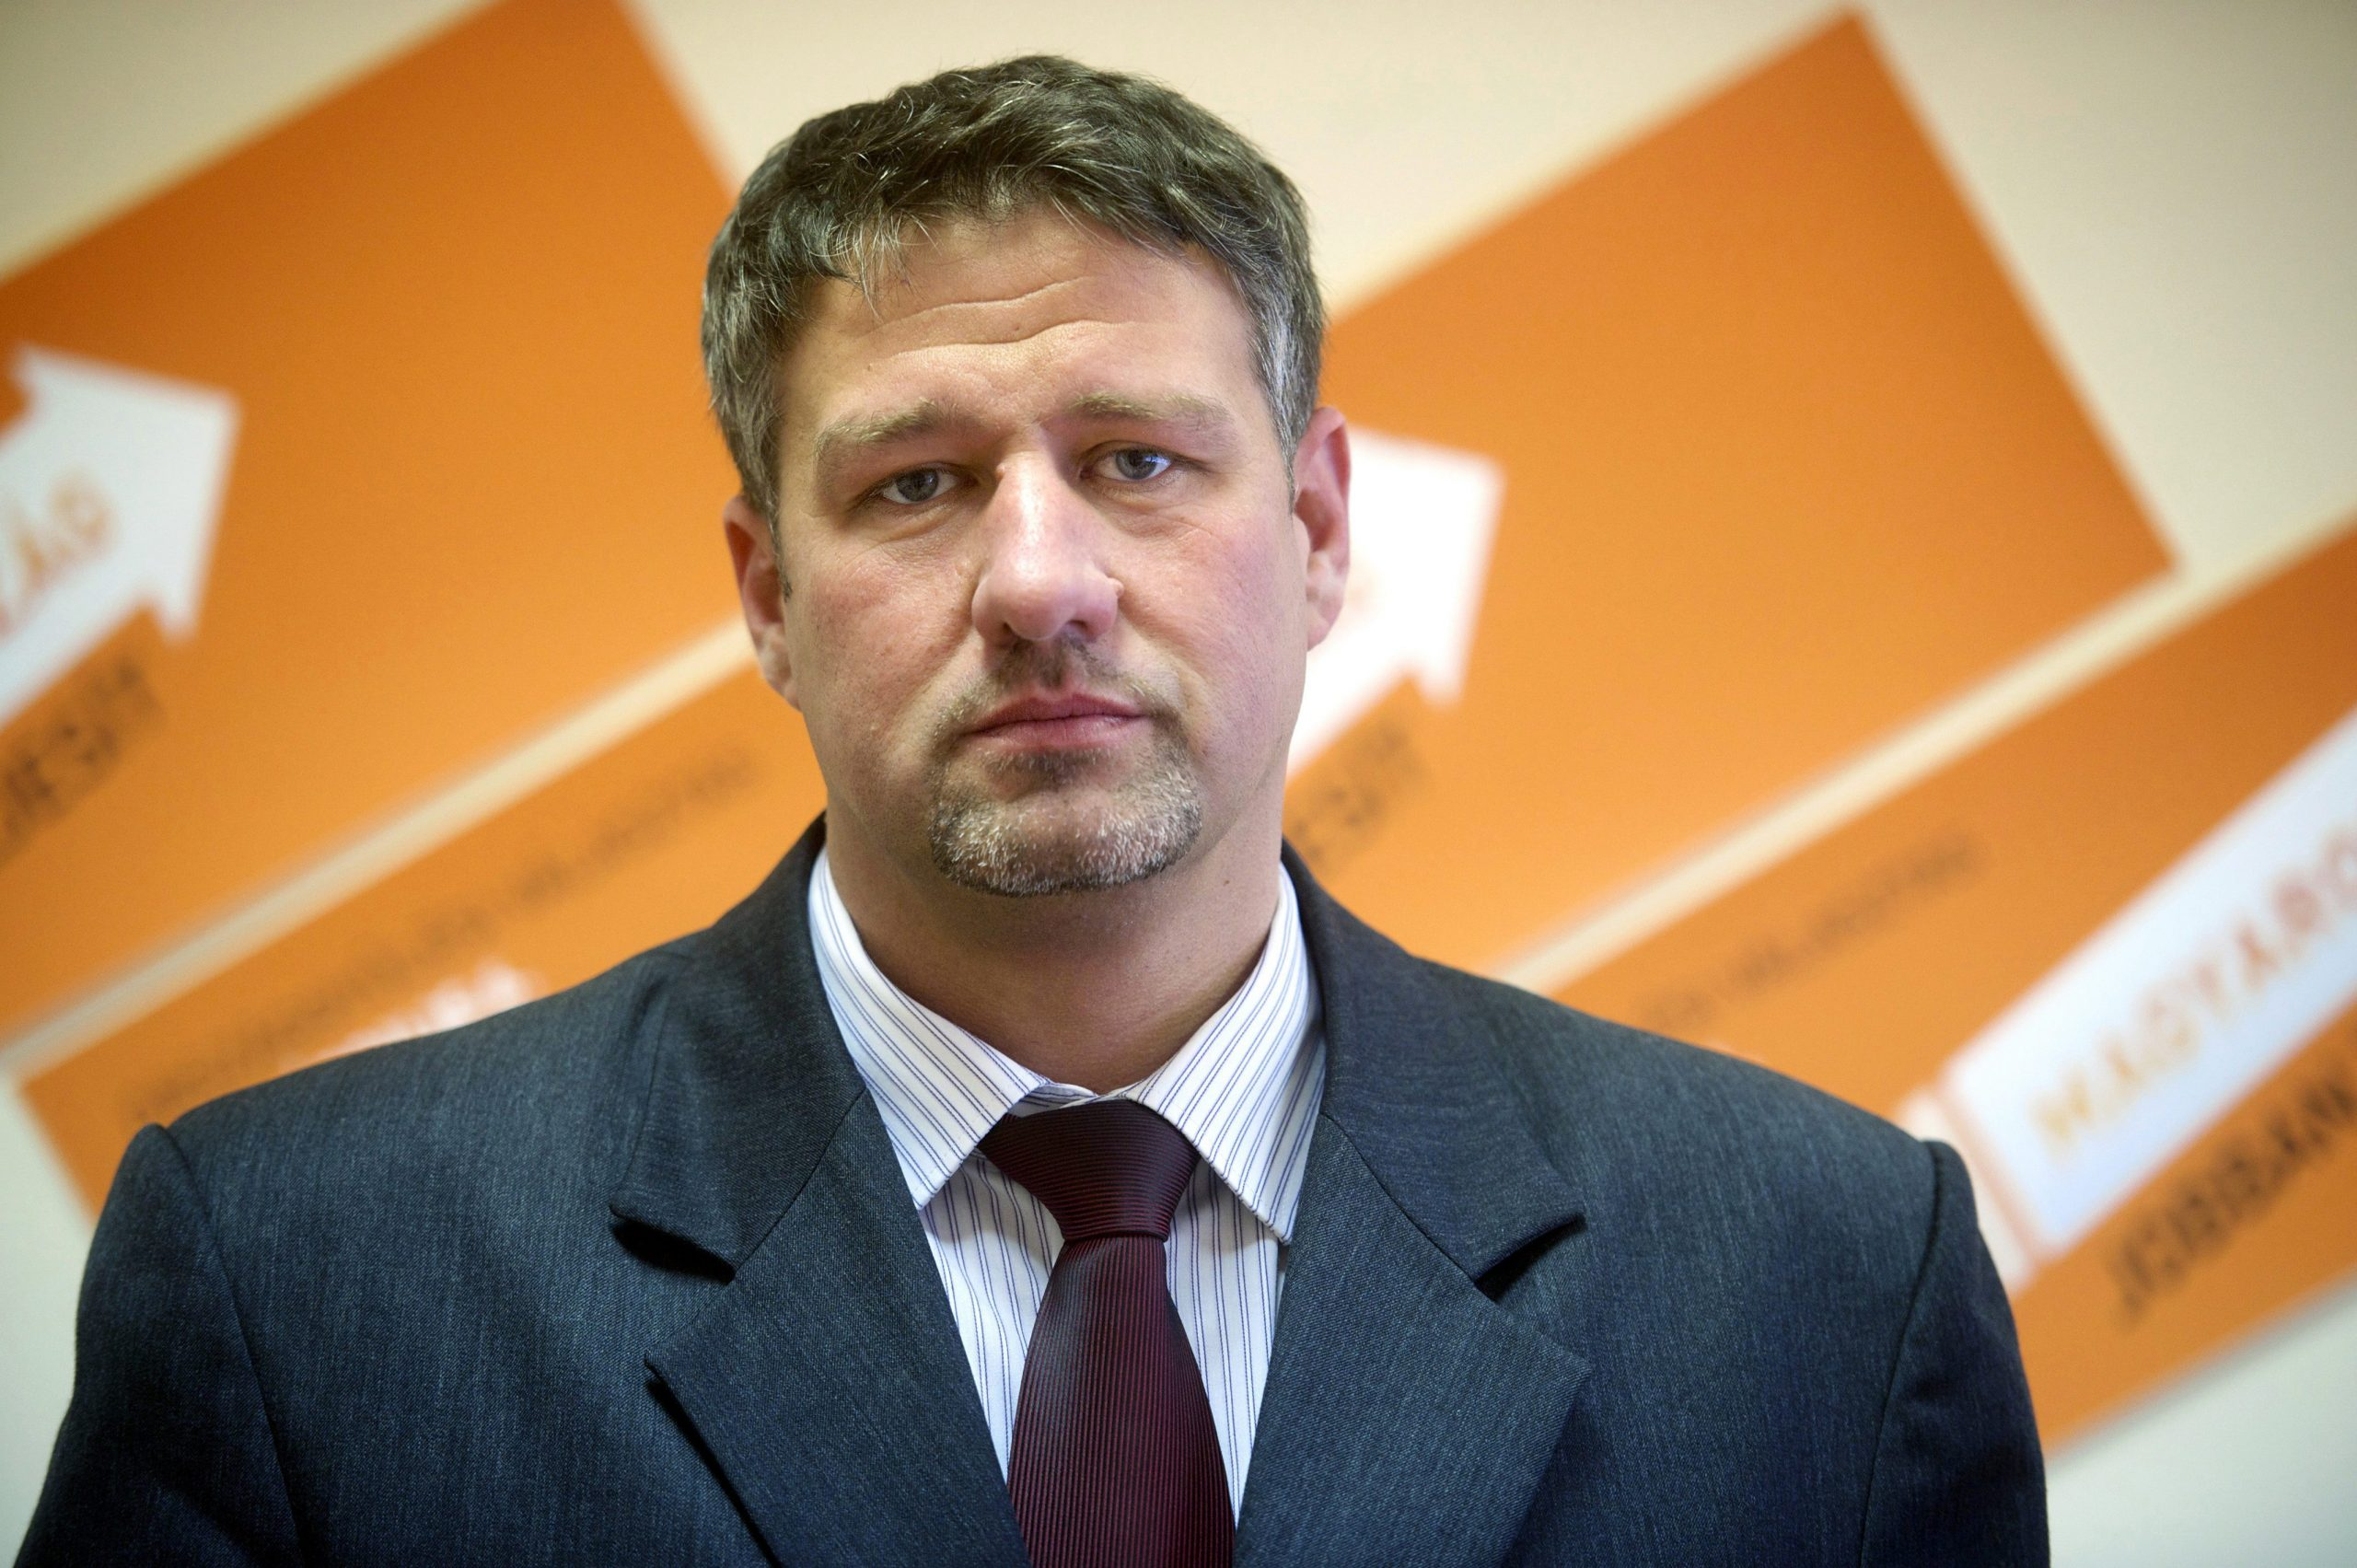 Fidesz MP Simonka's Immunity Suspended Once Again